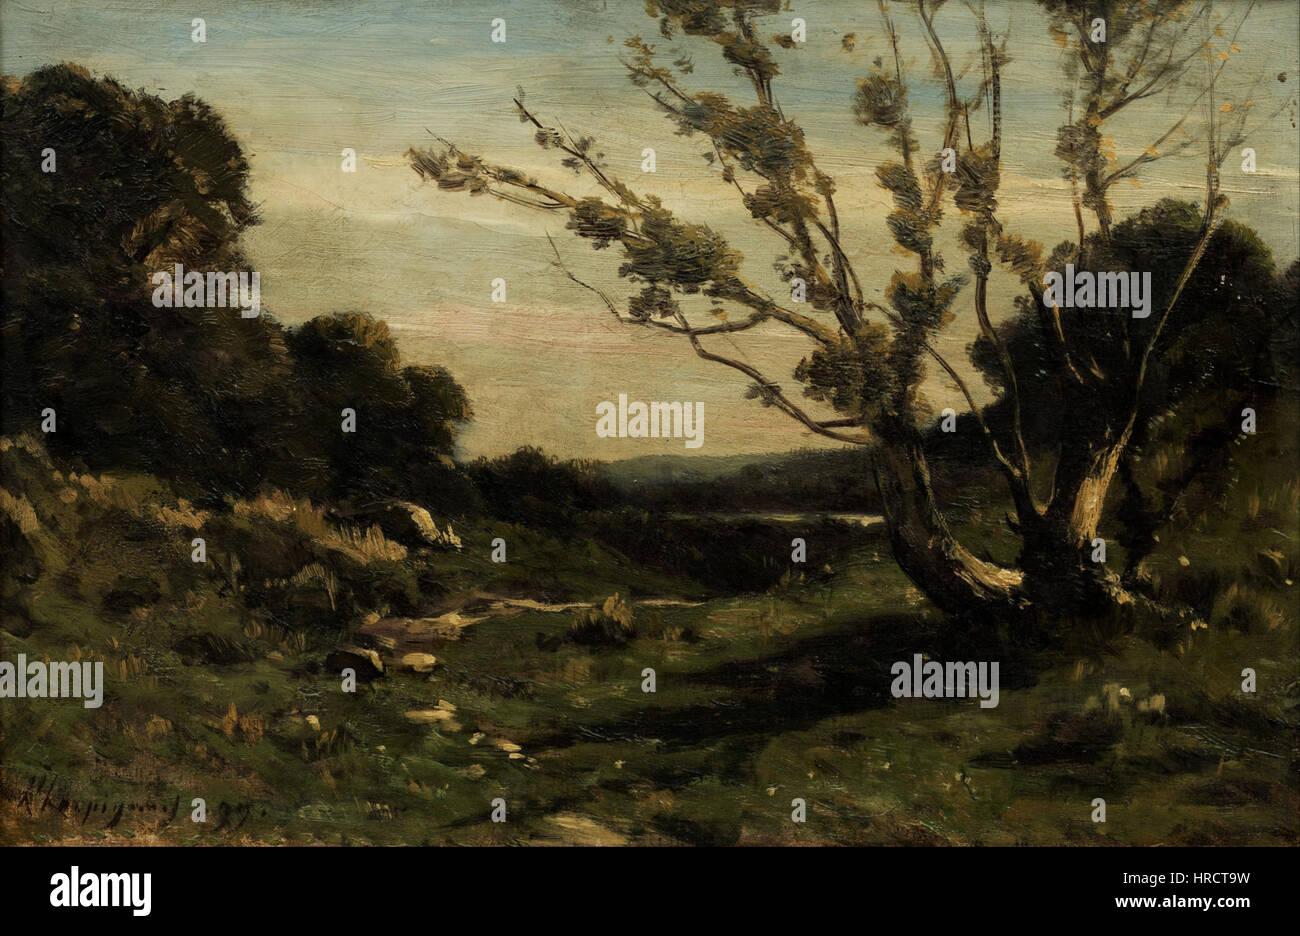 Henri Harpignies - Morning in the Nievre - Google Art Project - Stock Image